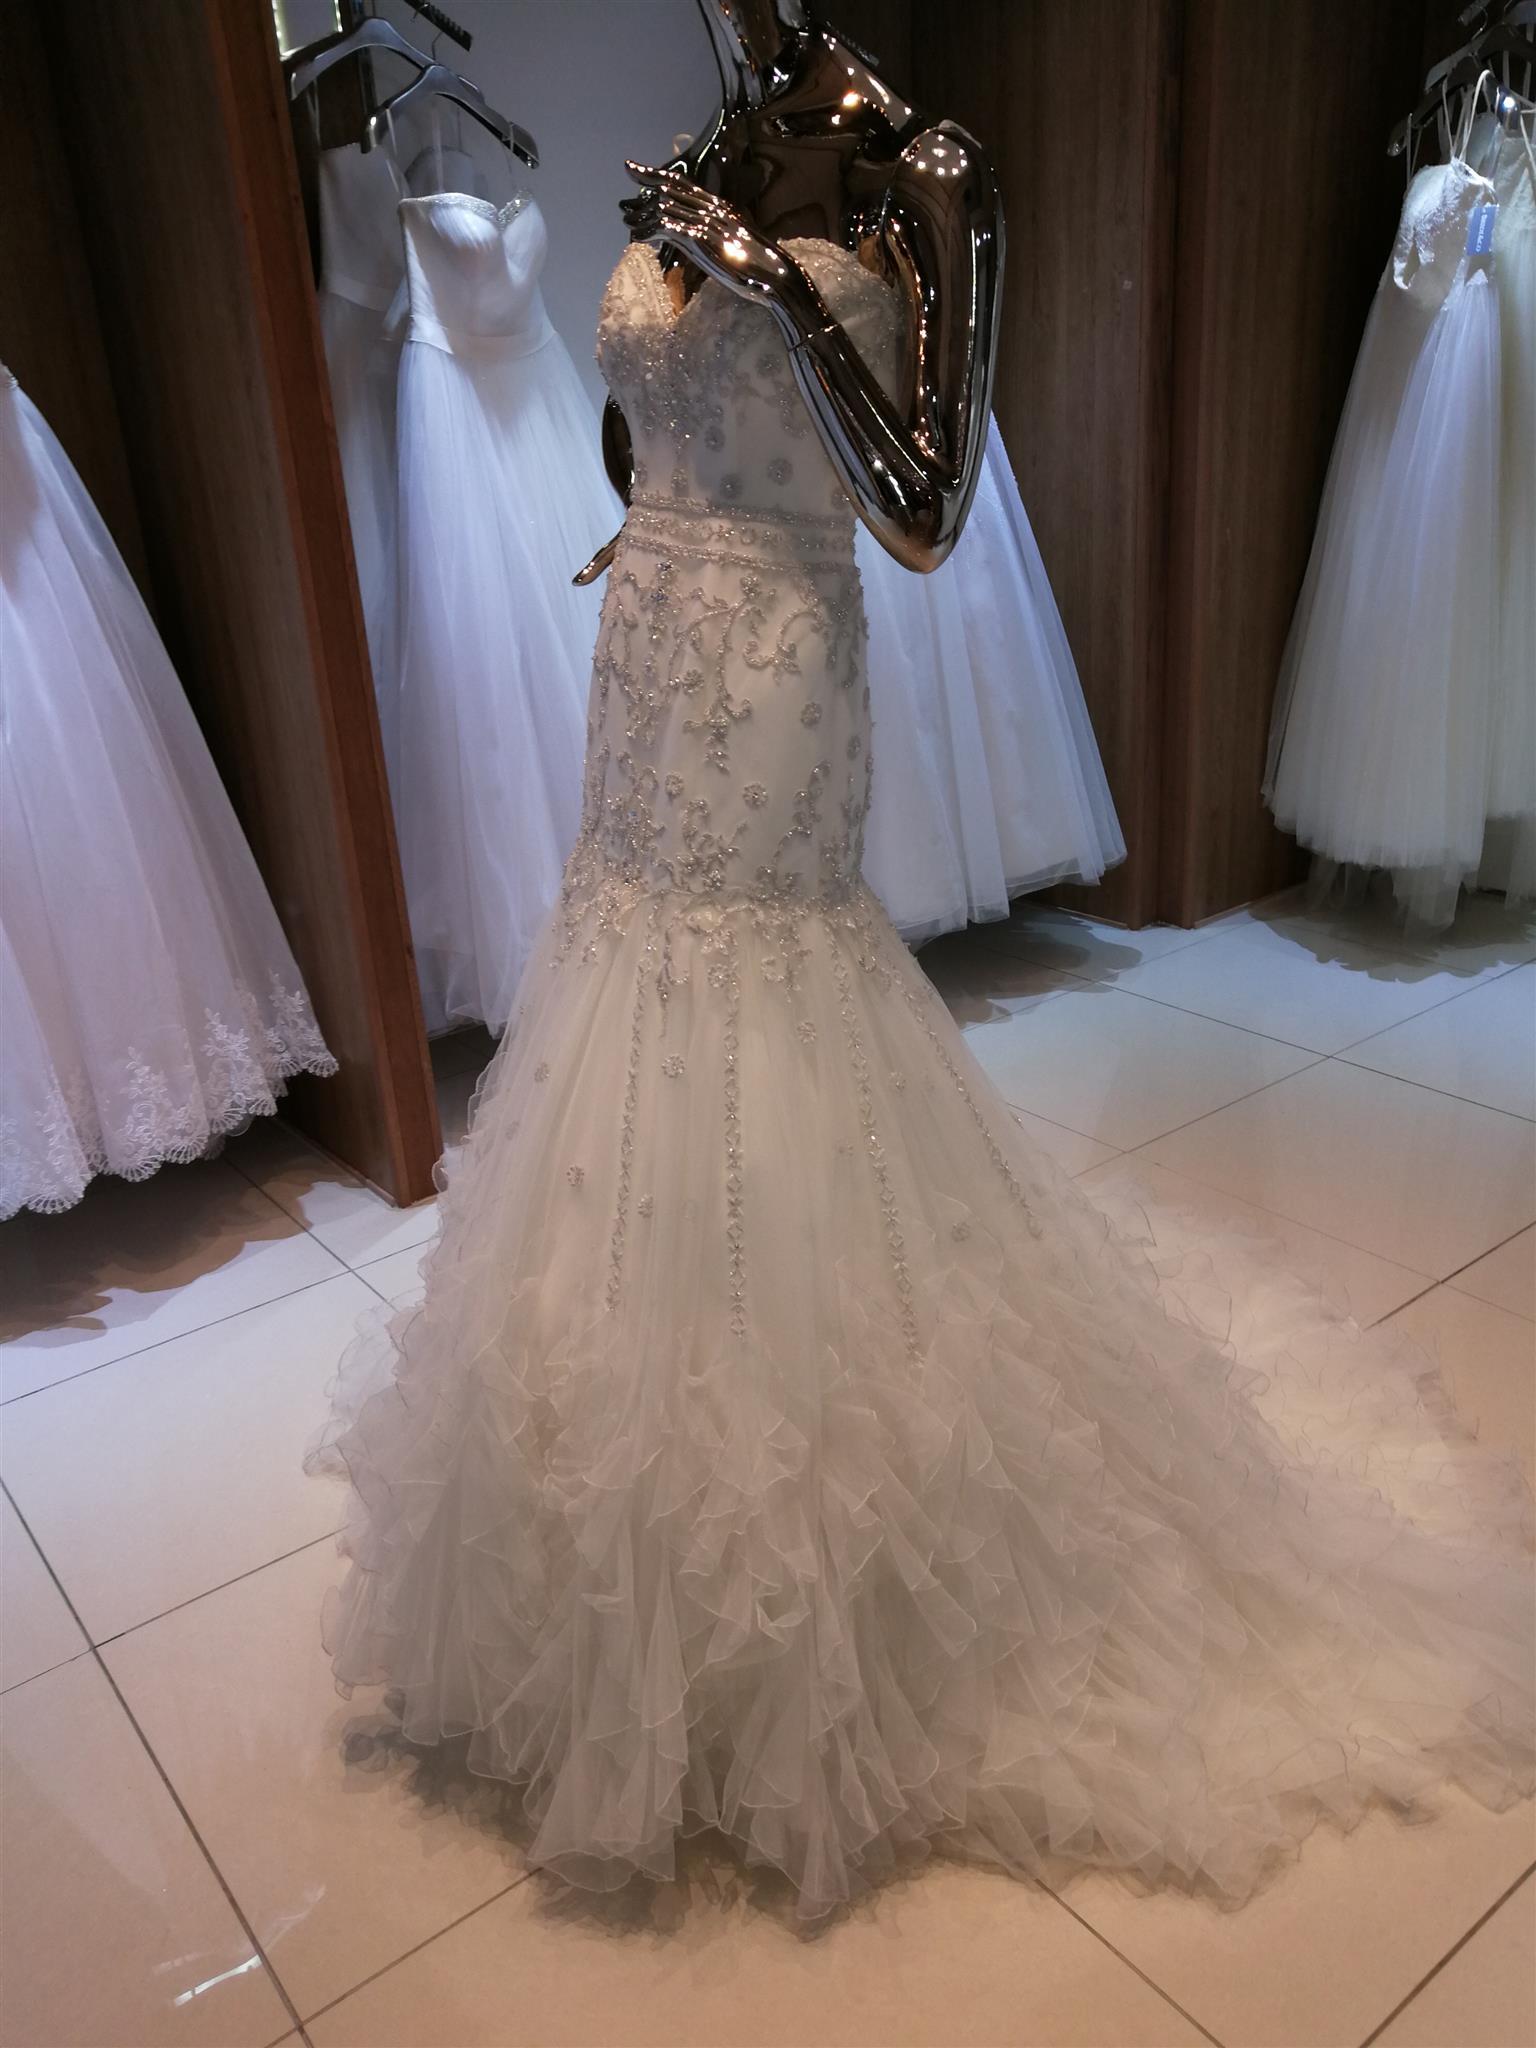 BRAND NEW Viola Chan wedding dress for sale- R12K Neg.